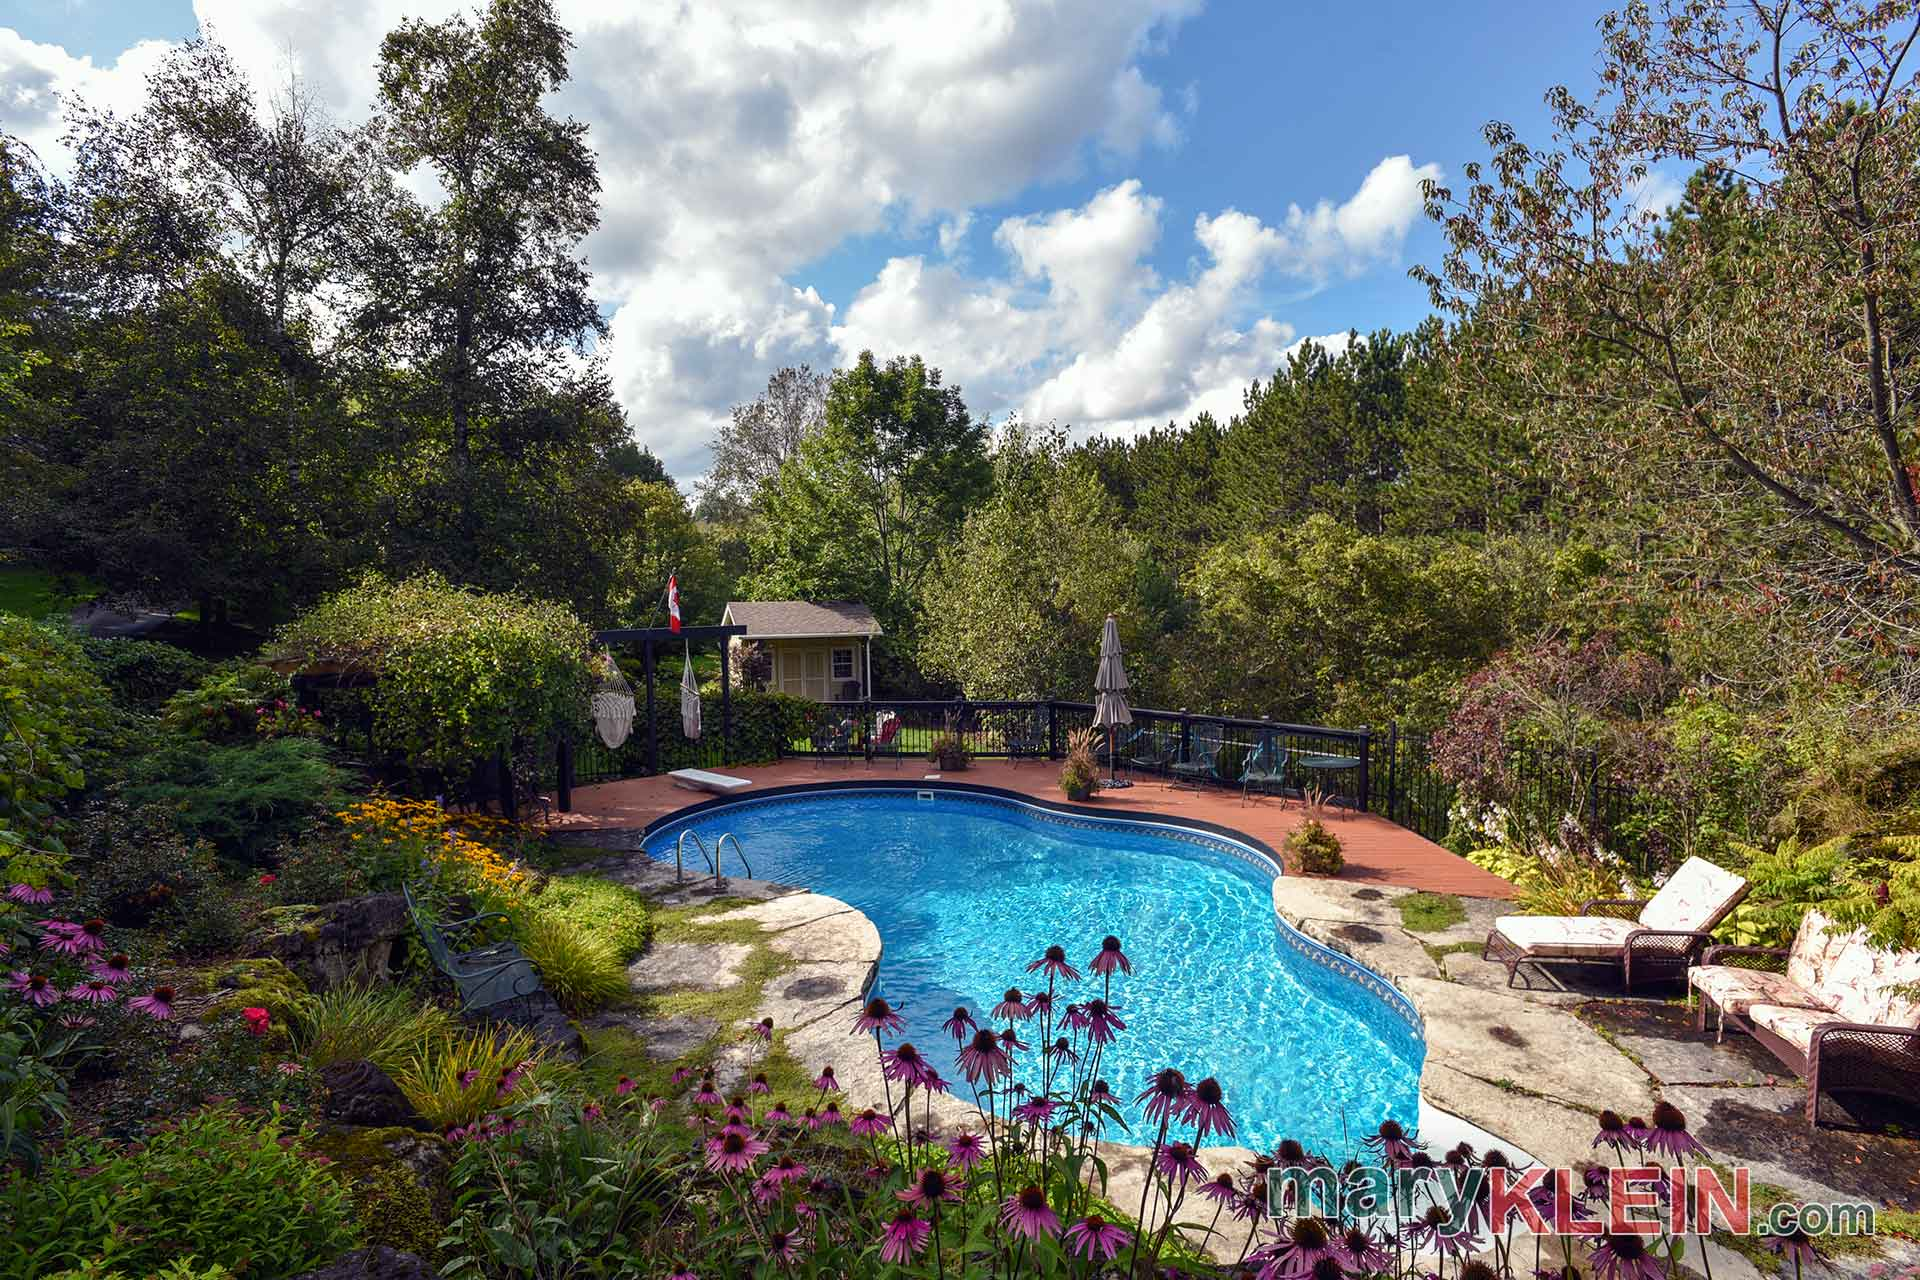 in-ground pool, caledon, 20329 Main Street, Alton, Caledon, For Sale